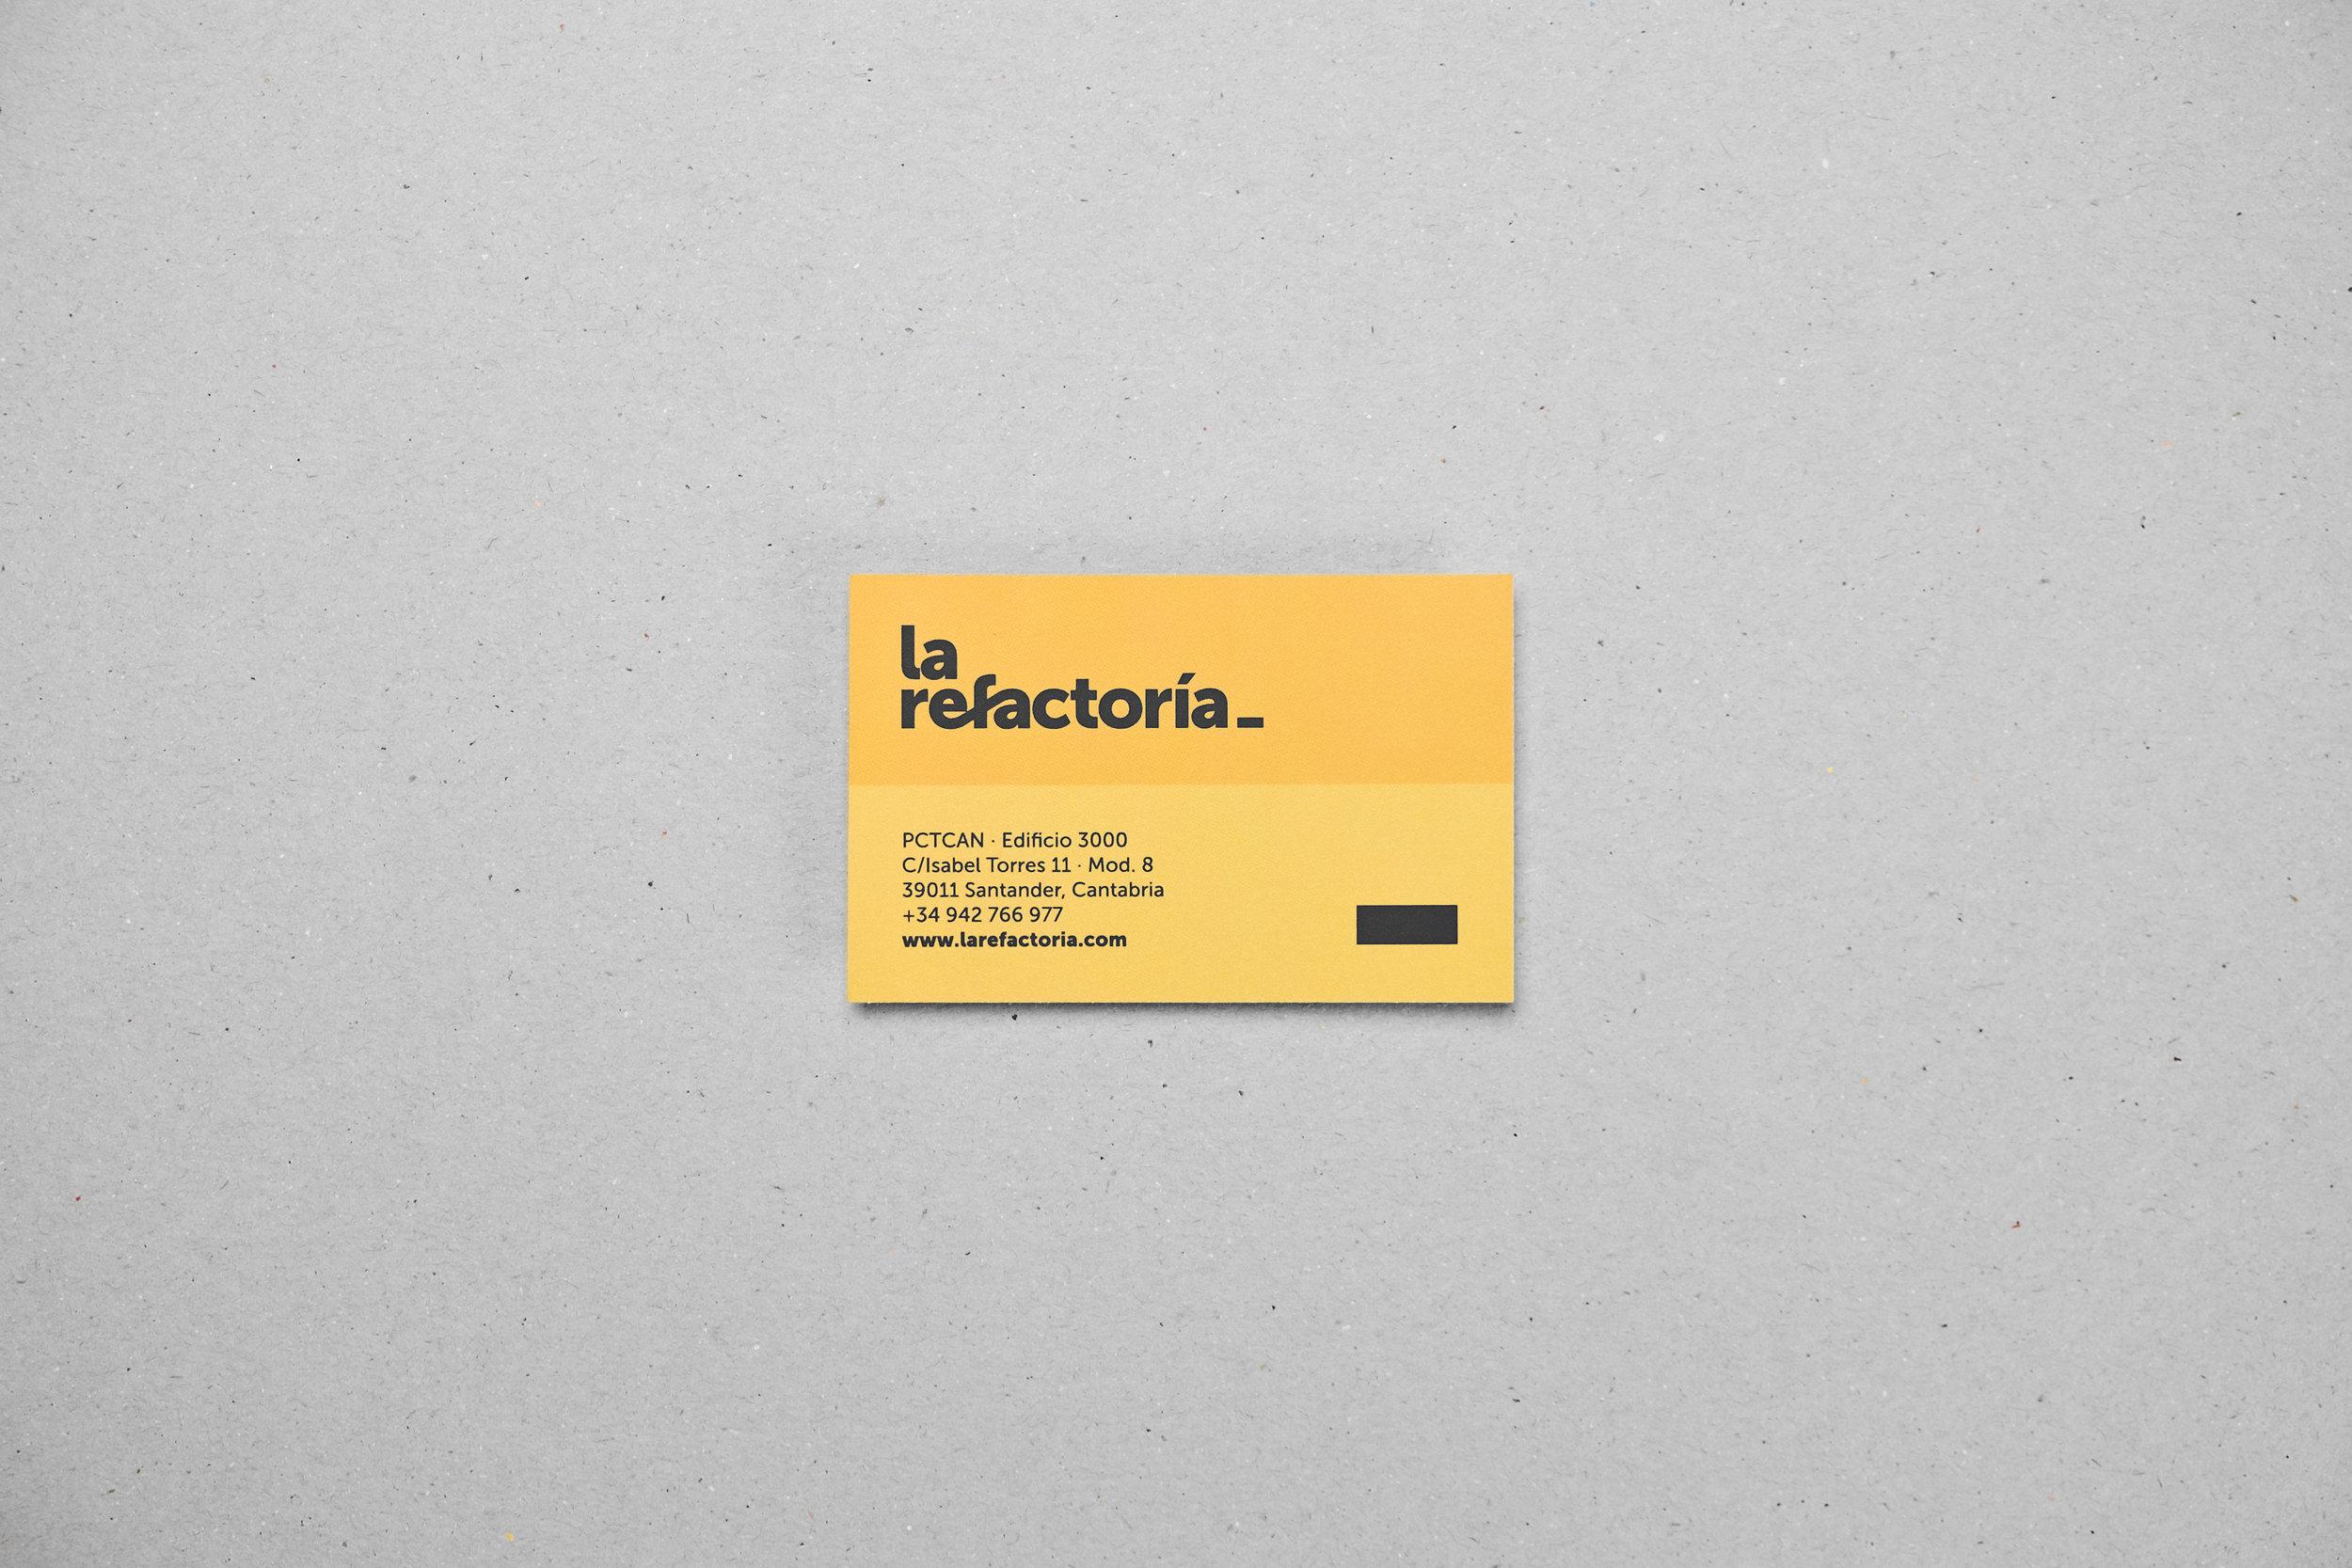 La Refactoria044.jpg